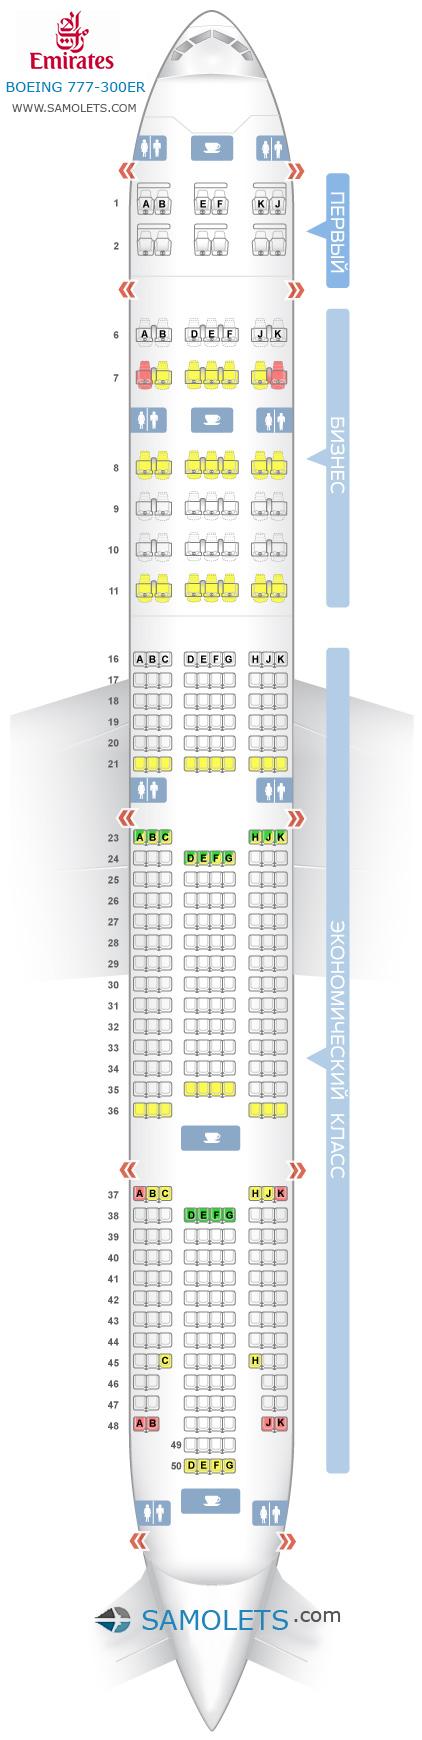 Боинг 777-300 эмирейтс схема салона